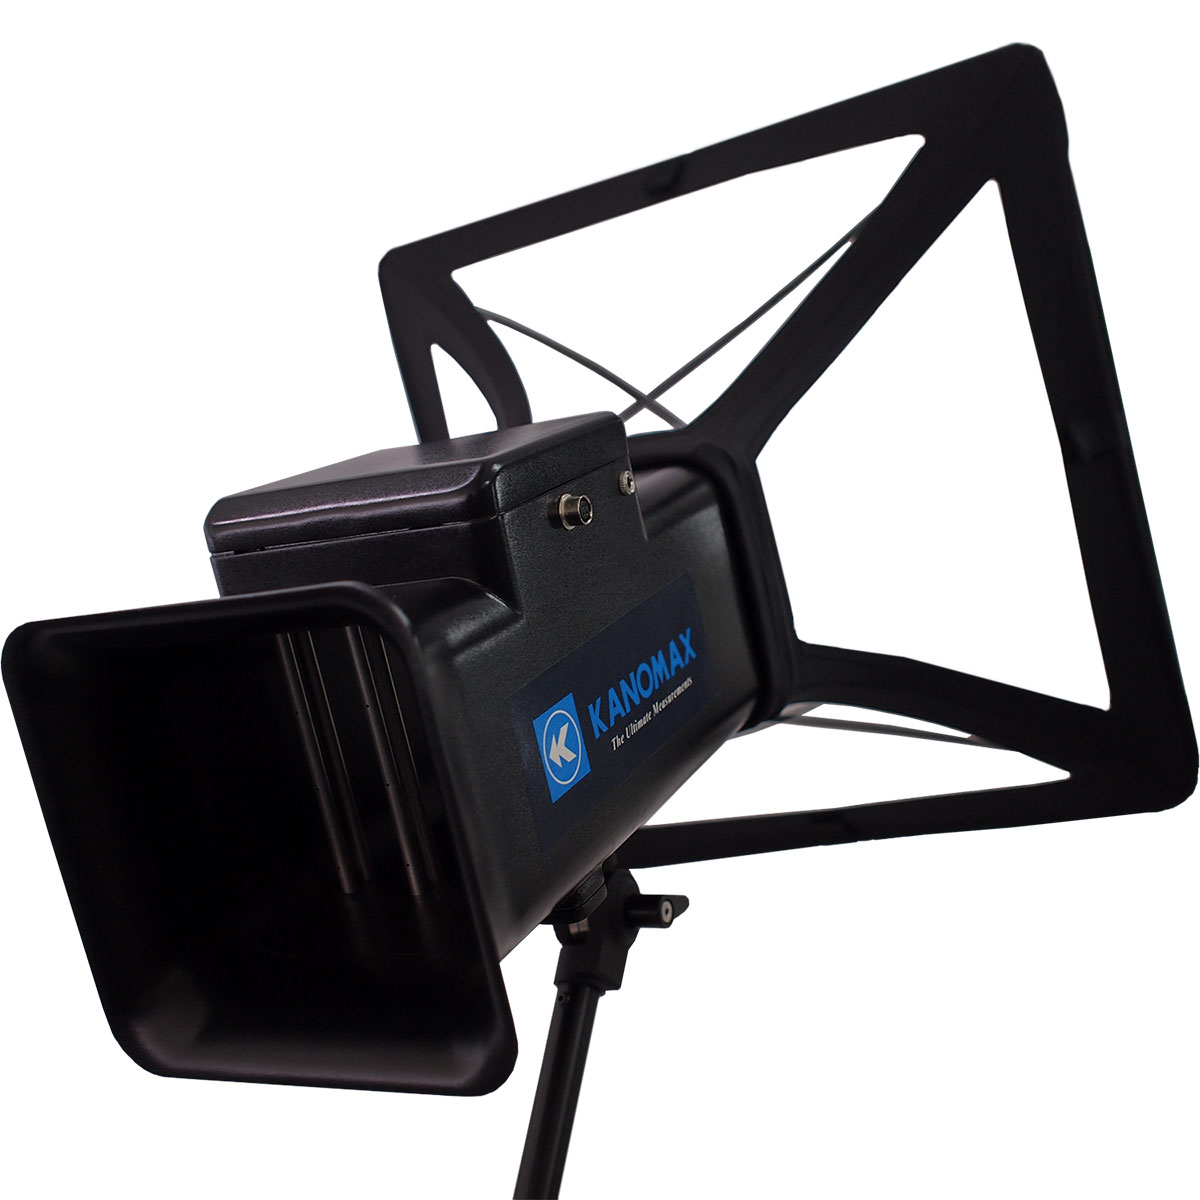 TABmaster Mini Airflow Capture Hood - Model 6750